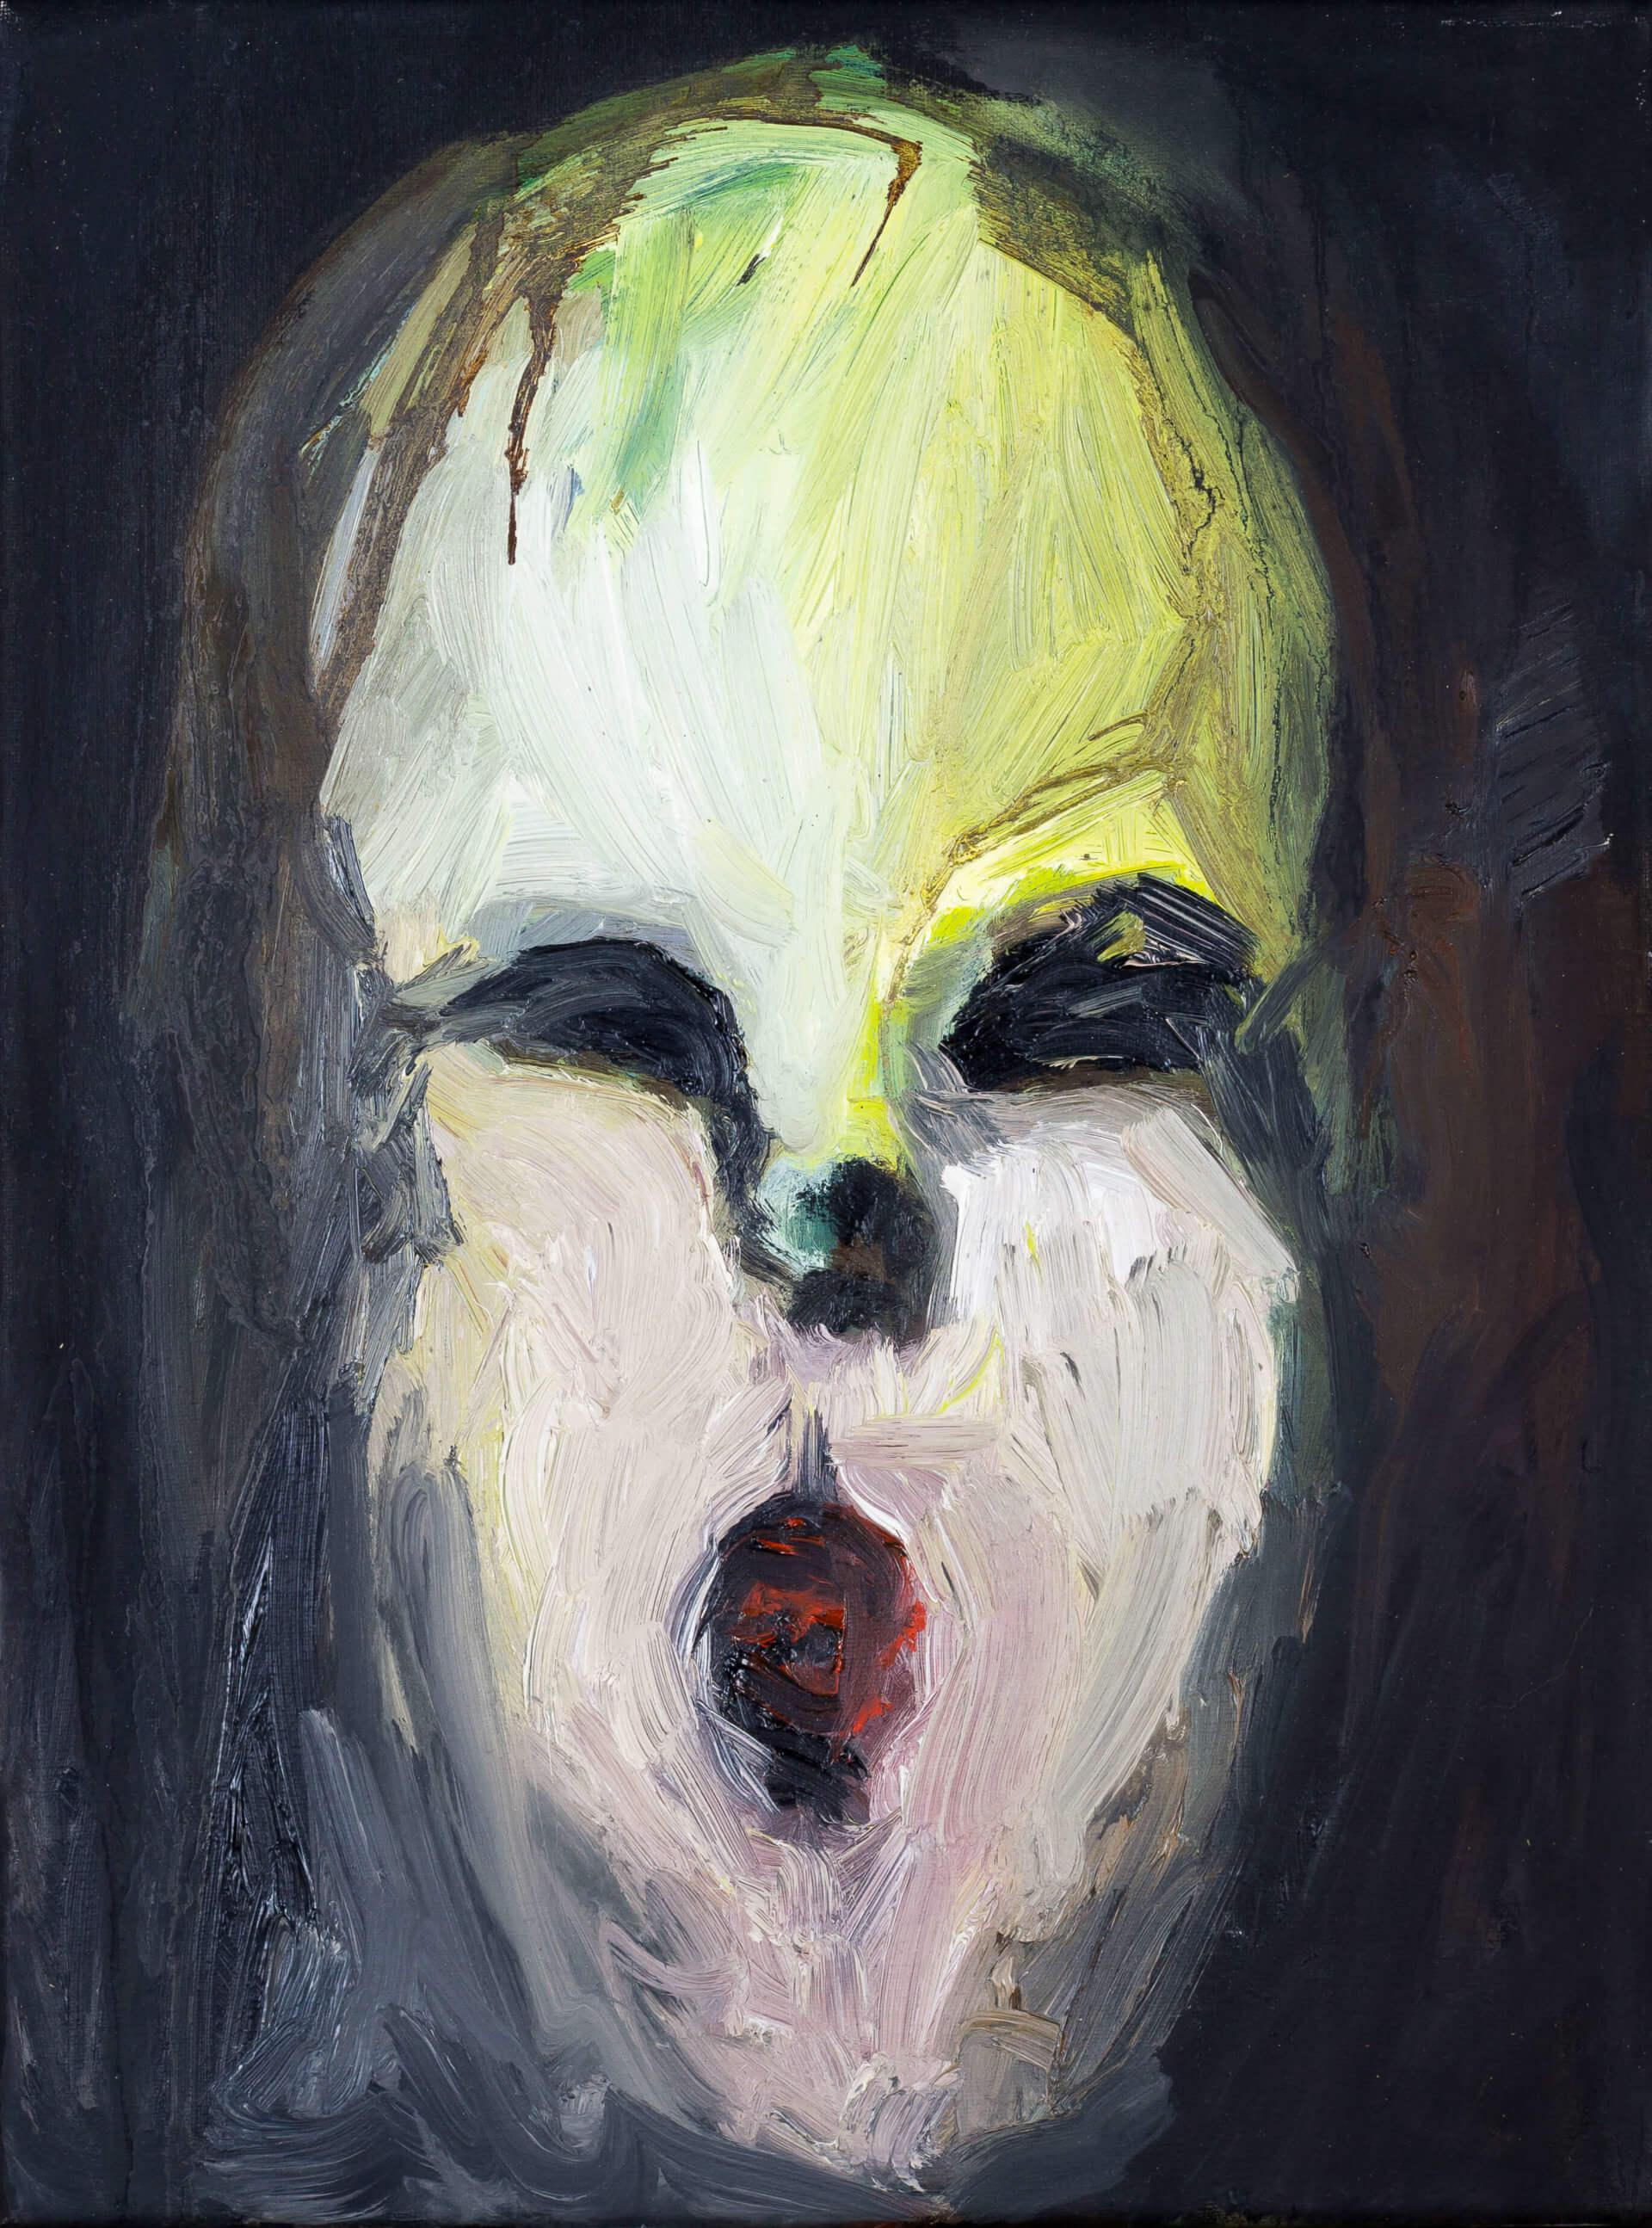 Katharina Albers, Transformation XXIV, 2011, Öl auf Leinwand,40×30 cm